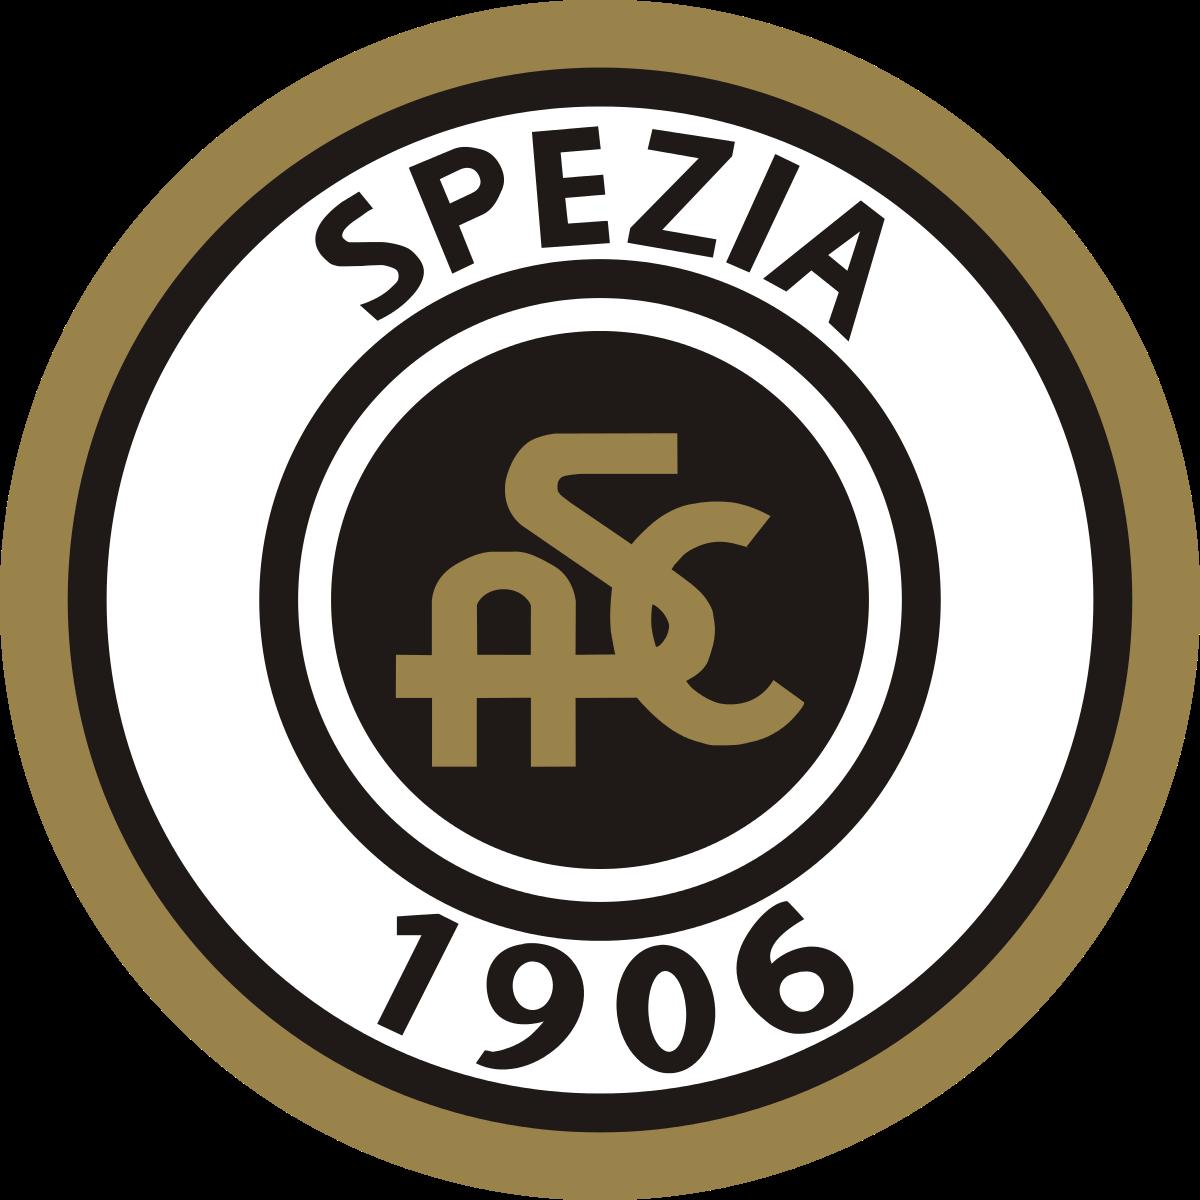 Programme TV Spezia